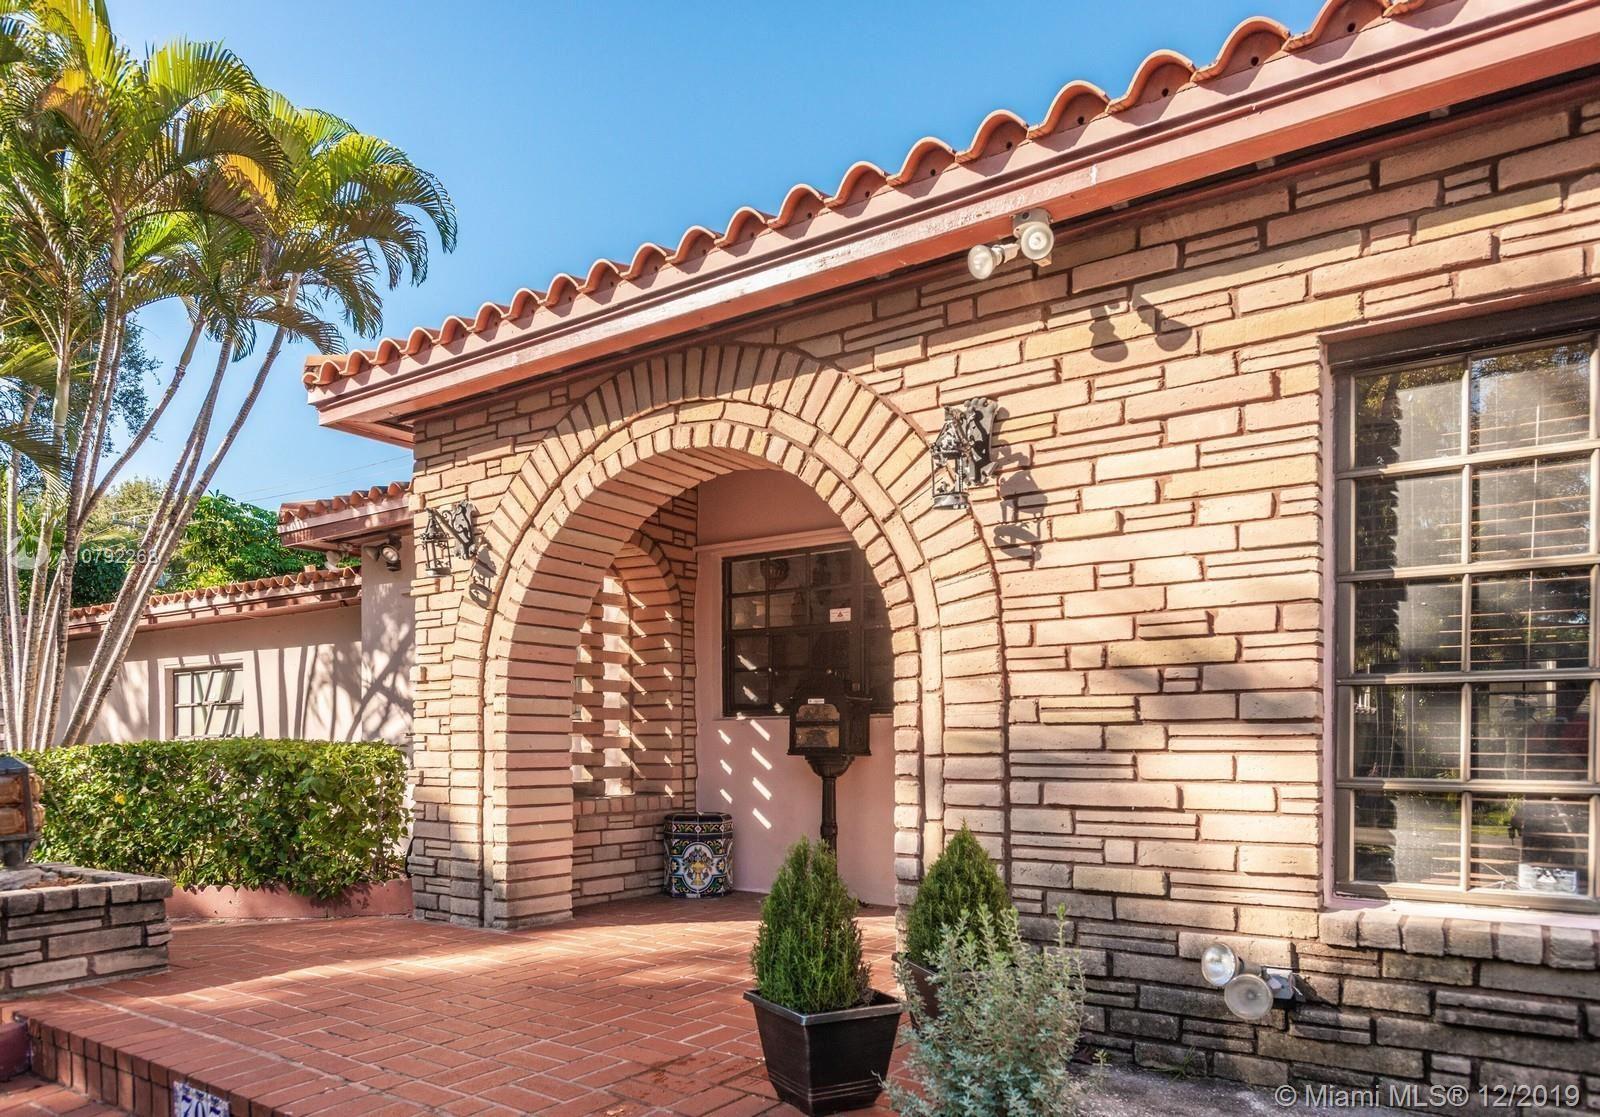 707 Anastasia Ave, Coral Gables, FL 33134 - #: A10792268